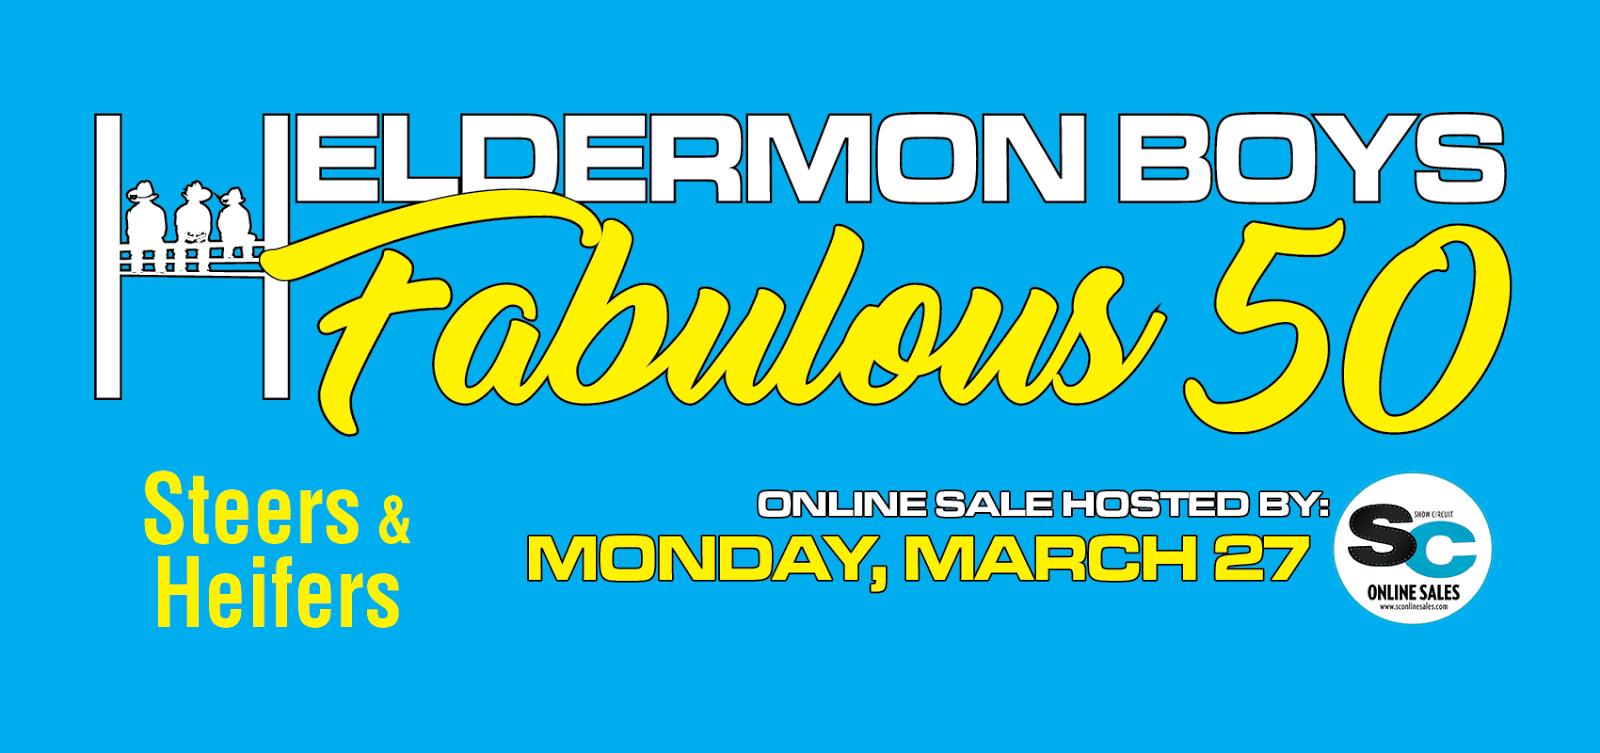 Heldermon Boys Fabulous 50